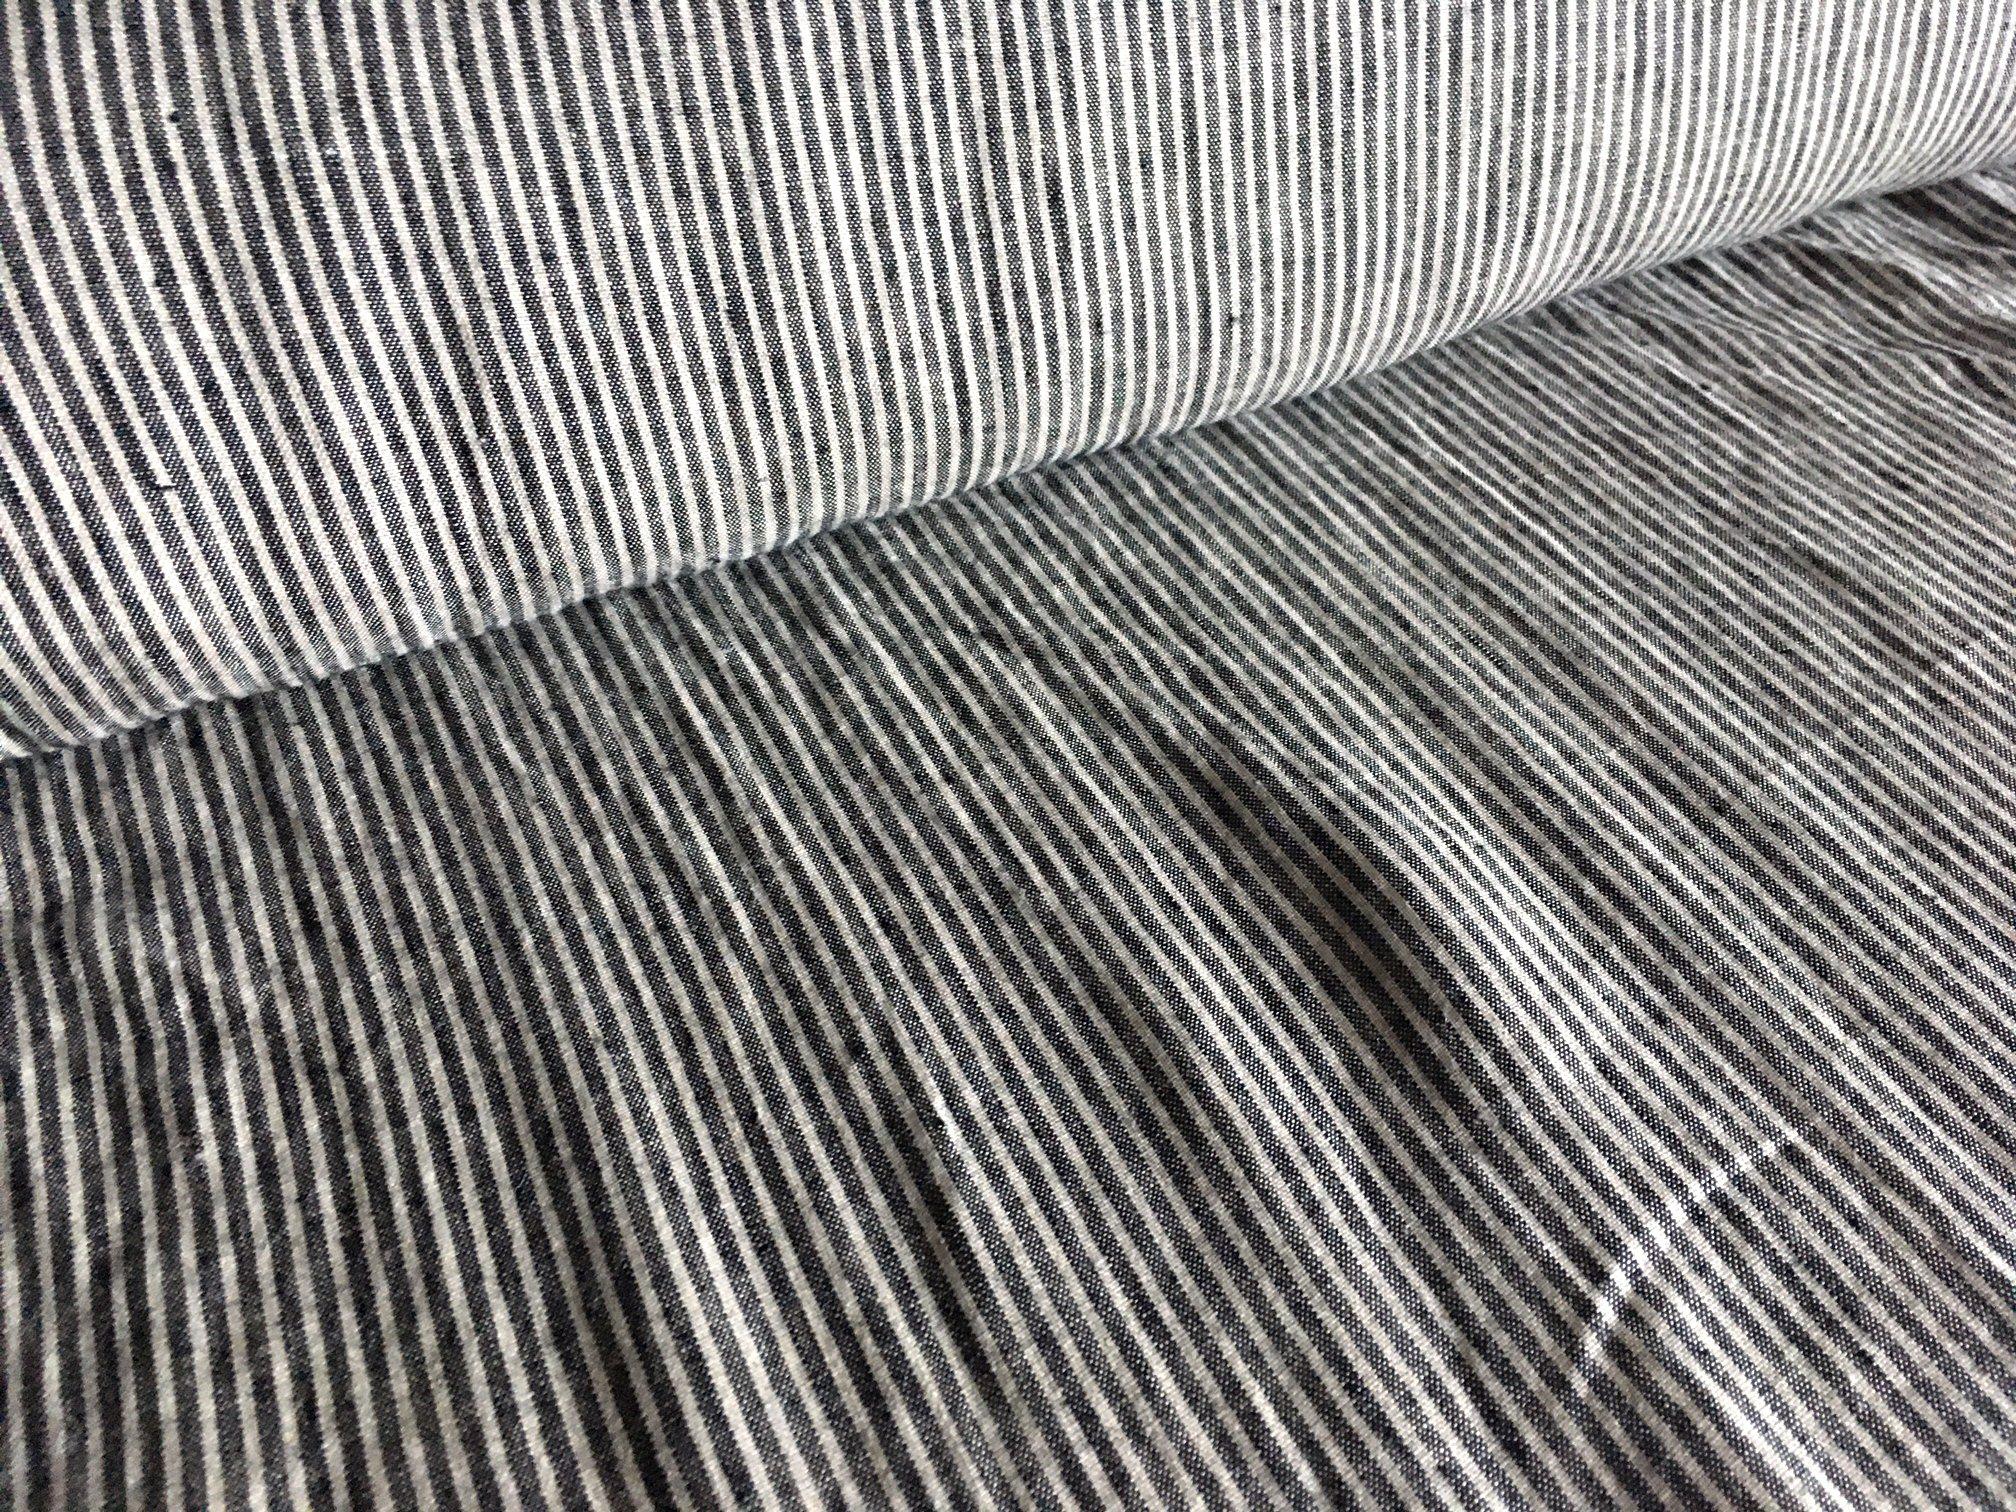 látka-len-premium-černo-šedý-pásek-170g